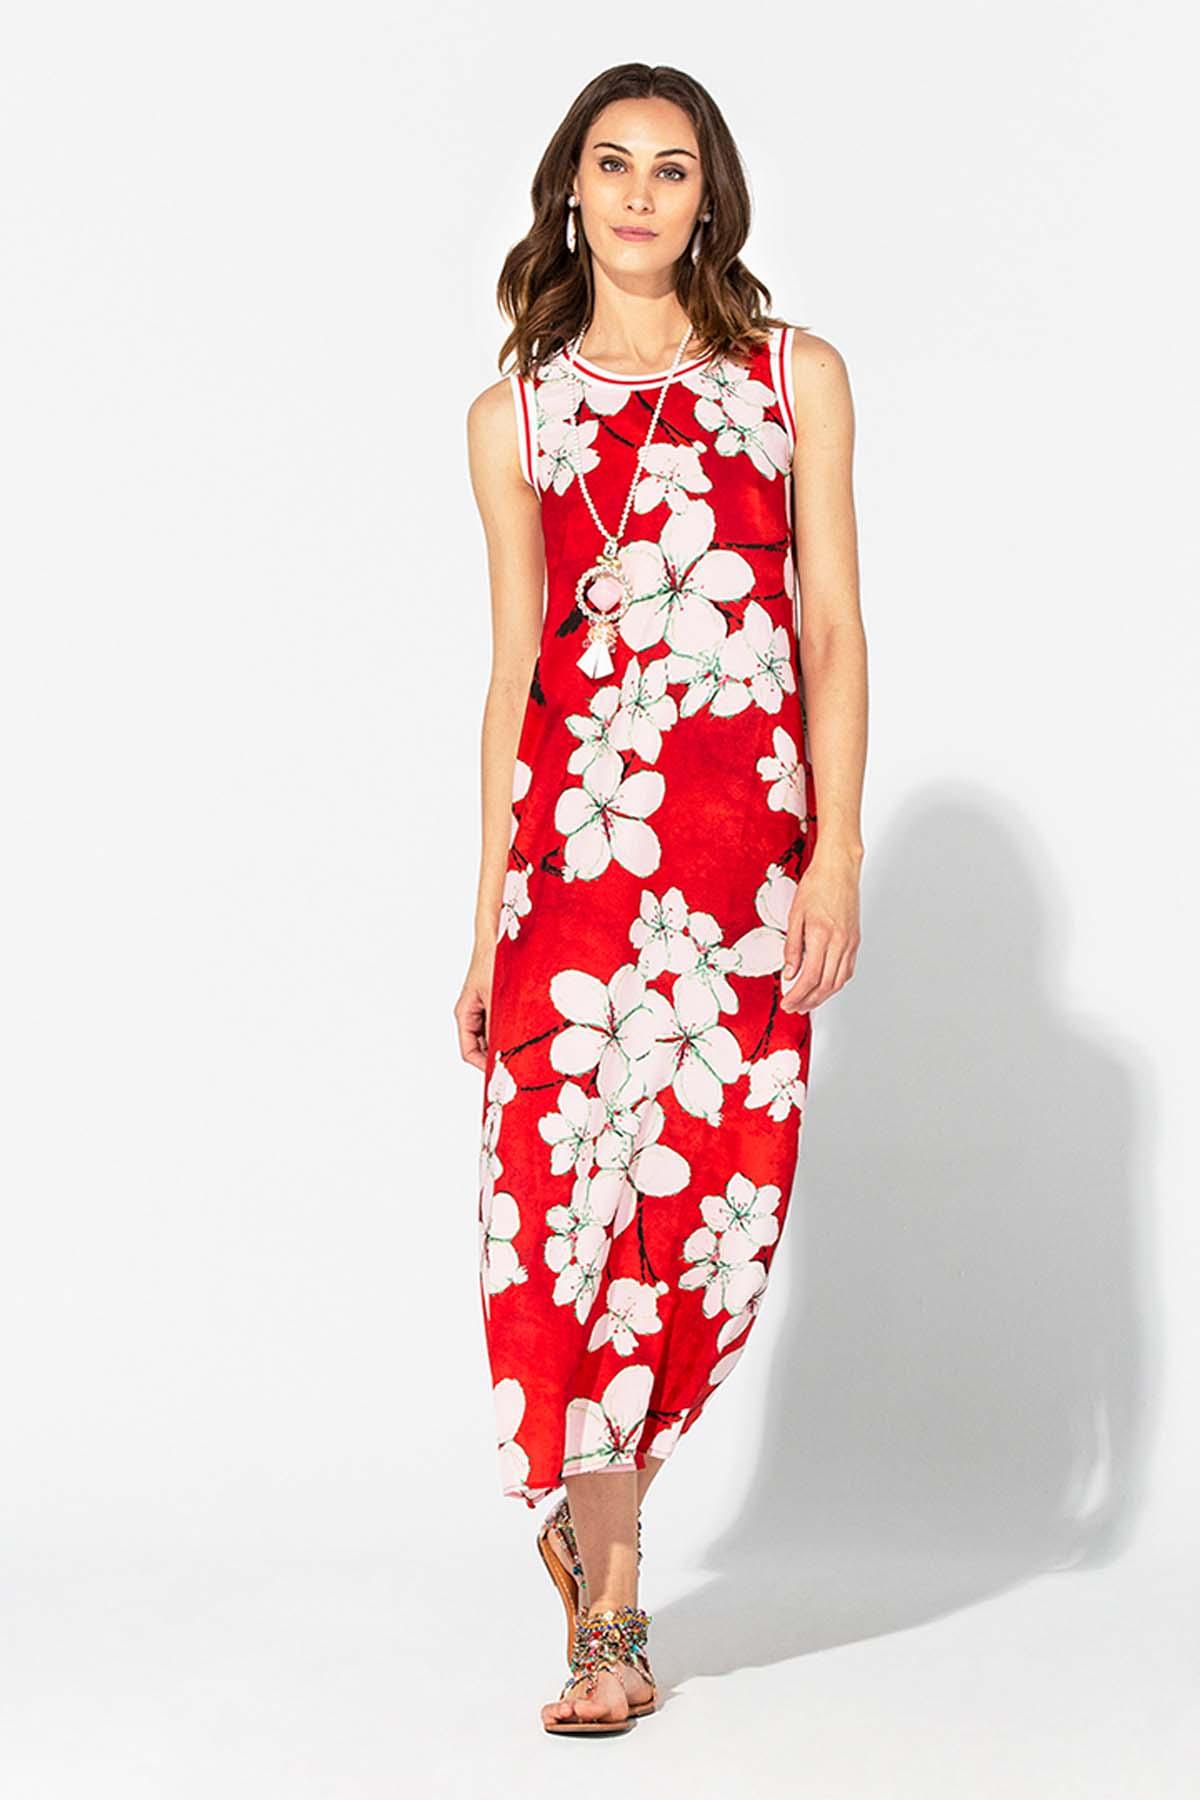 Teria Yabar - Vestido rojo largo de verano